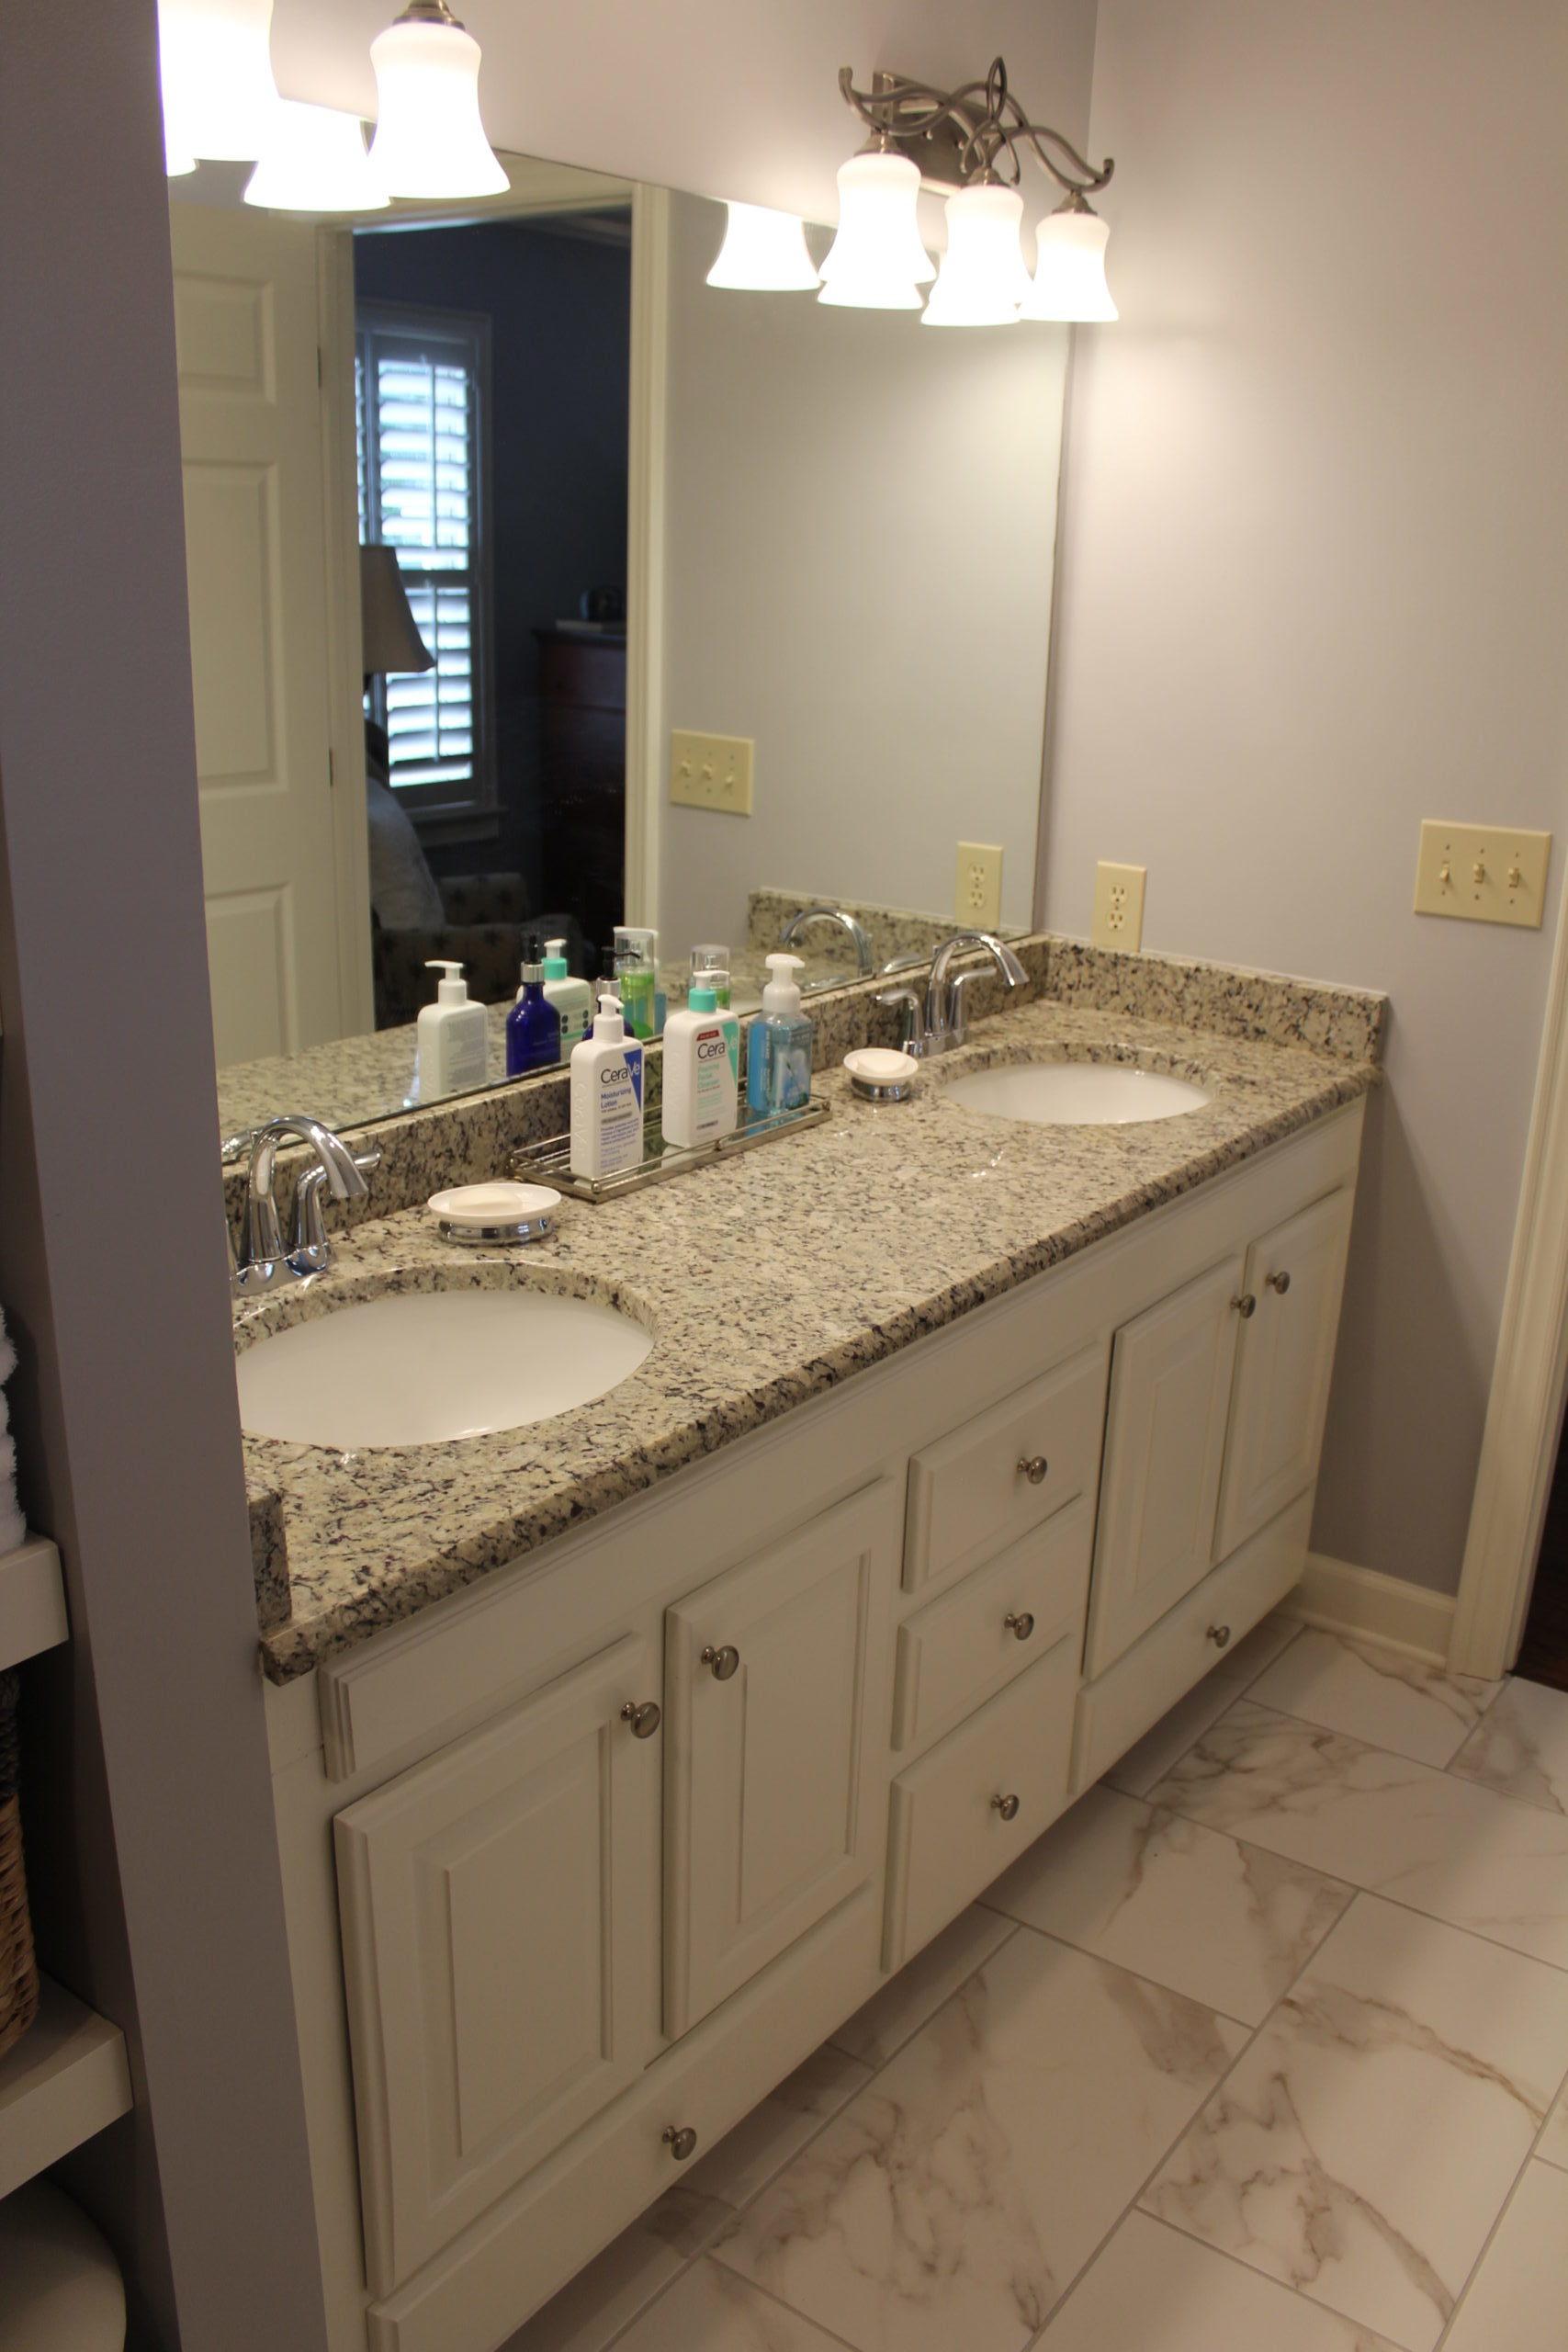 bathroom-remodeling-work-TAG-Builders-108-AD-Bathroom-Remodel-4-scaled-e1586518650576